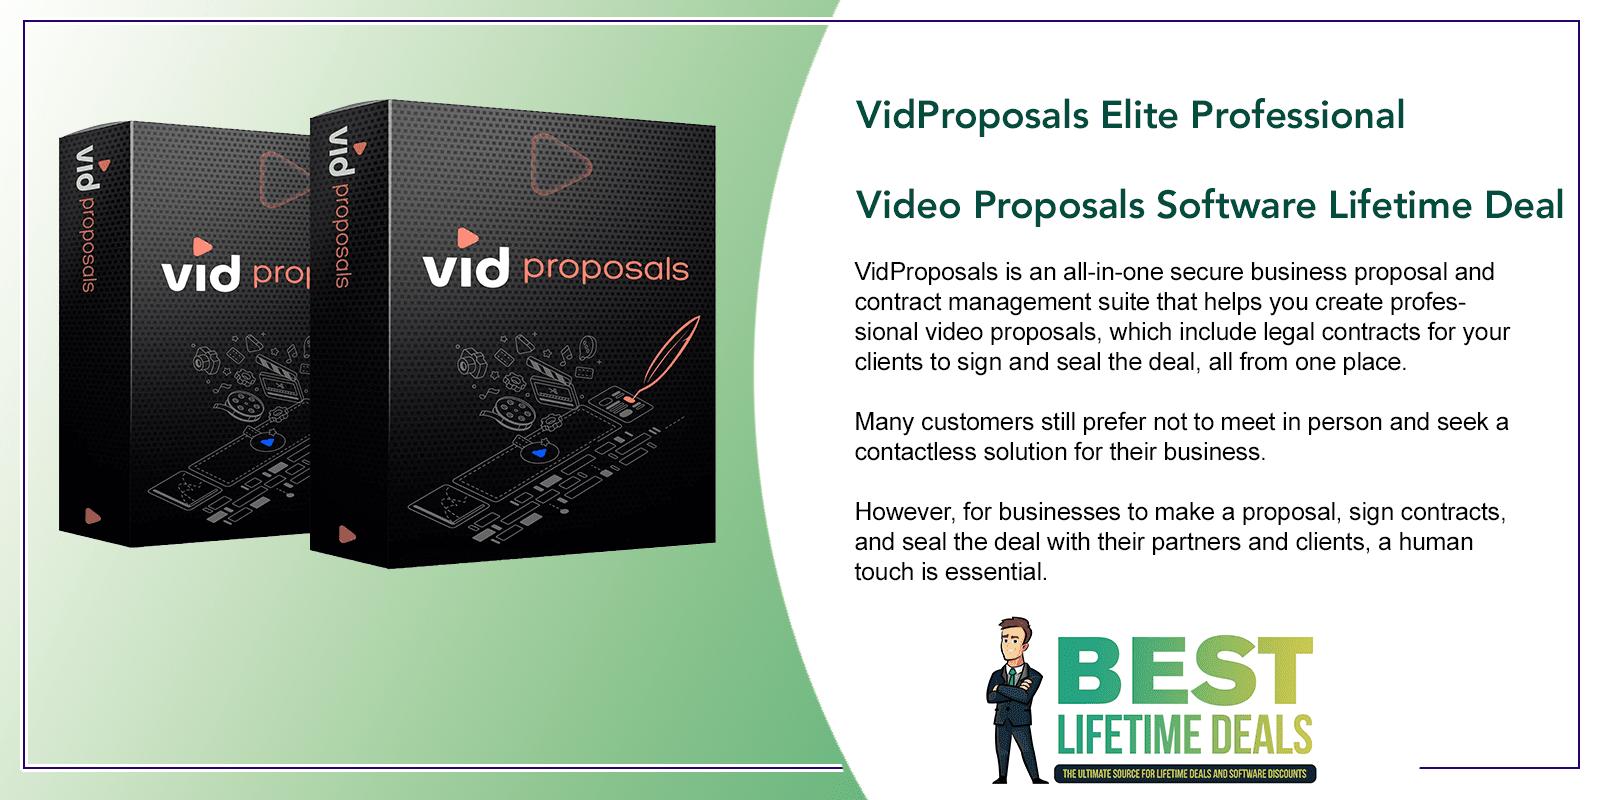 VidProposals Elite Professional Video Proposals Software Featured Image